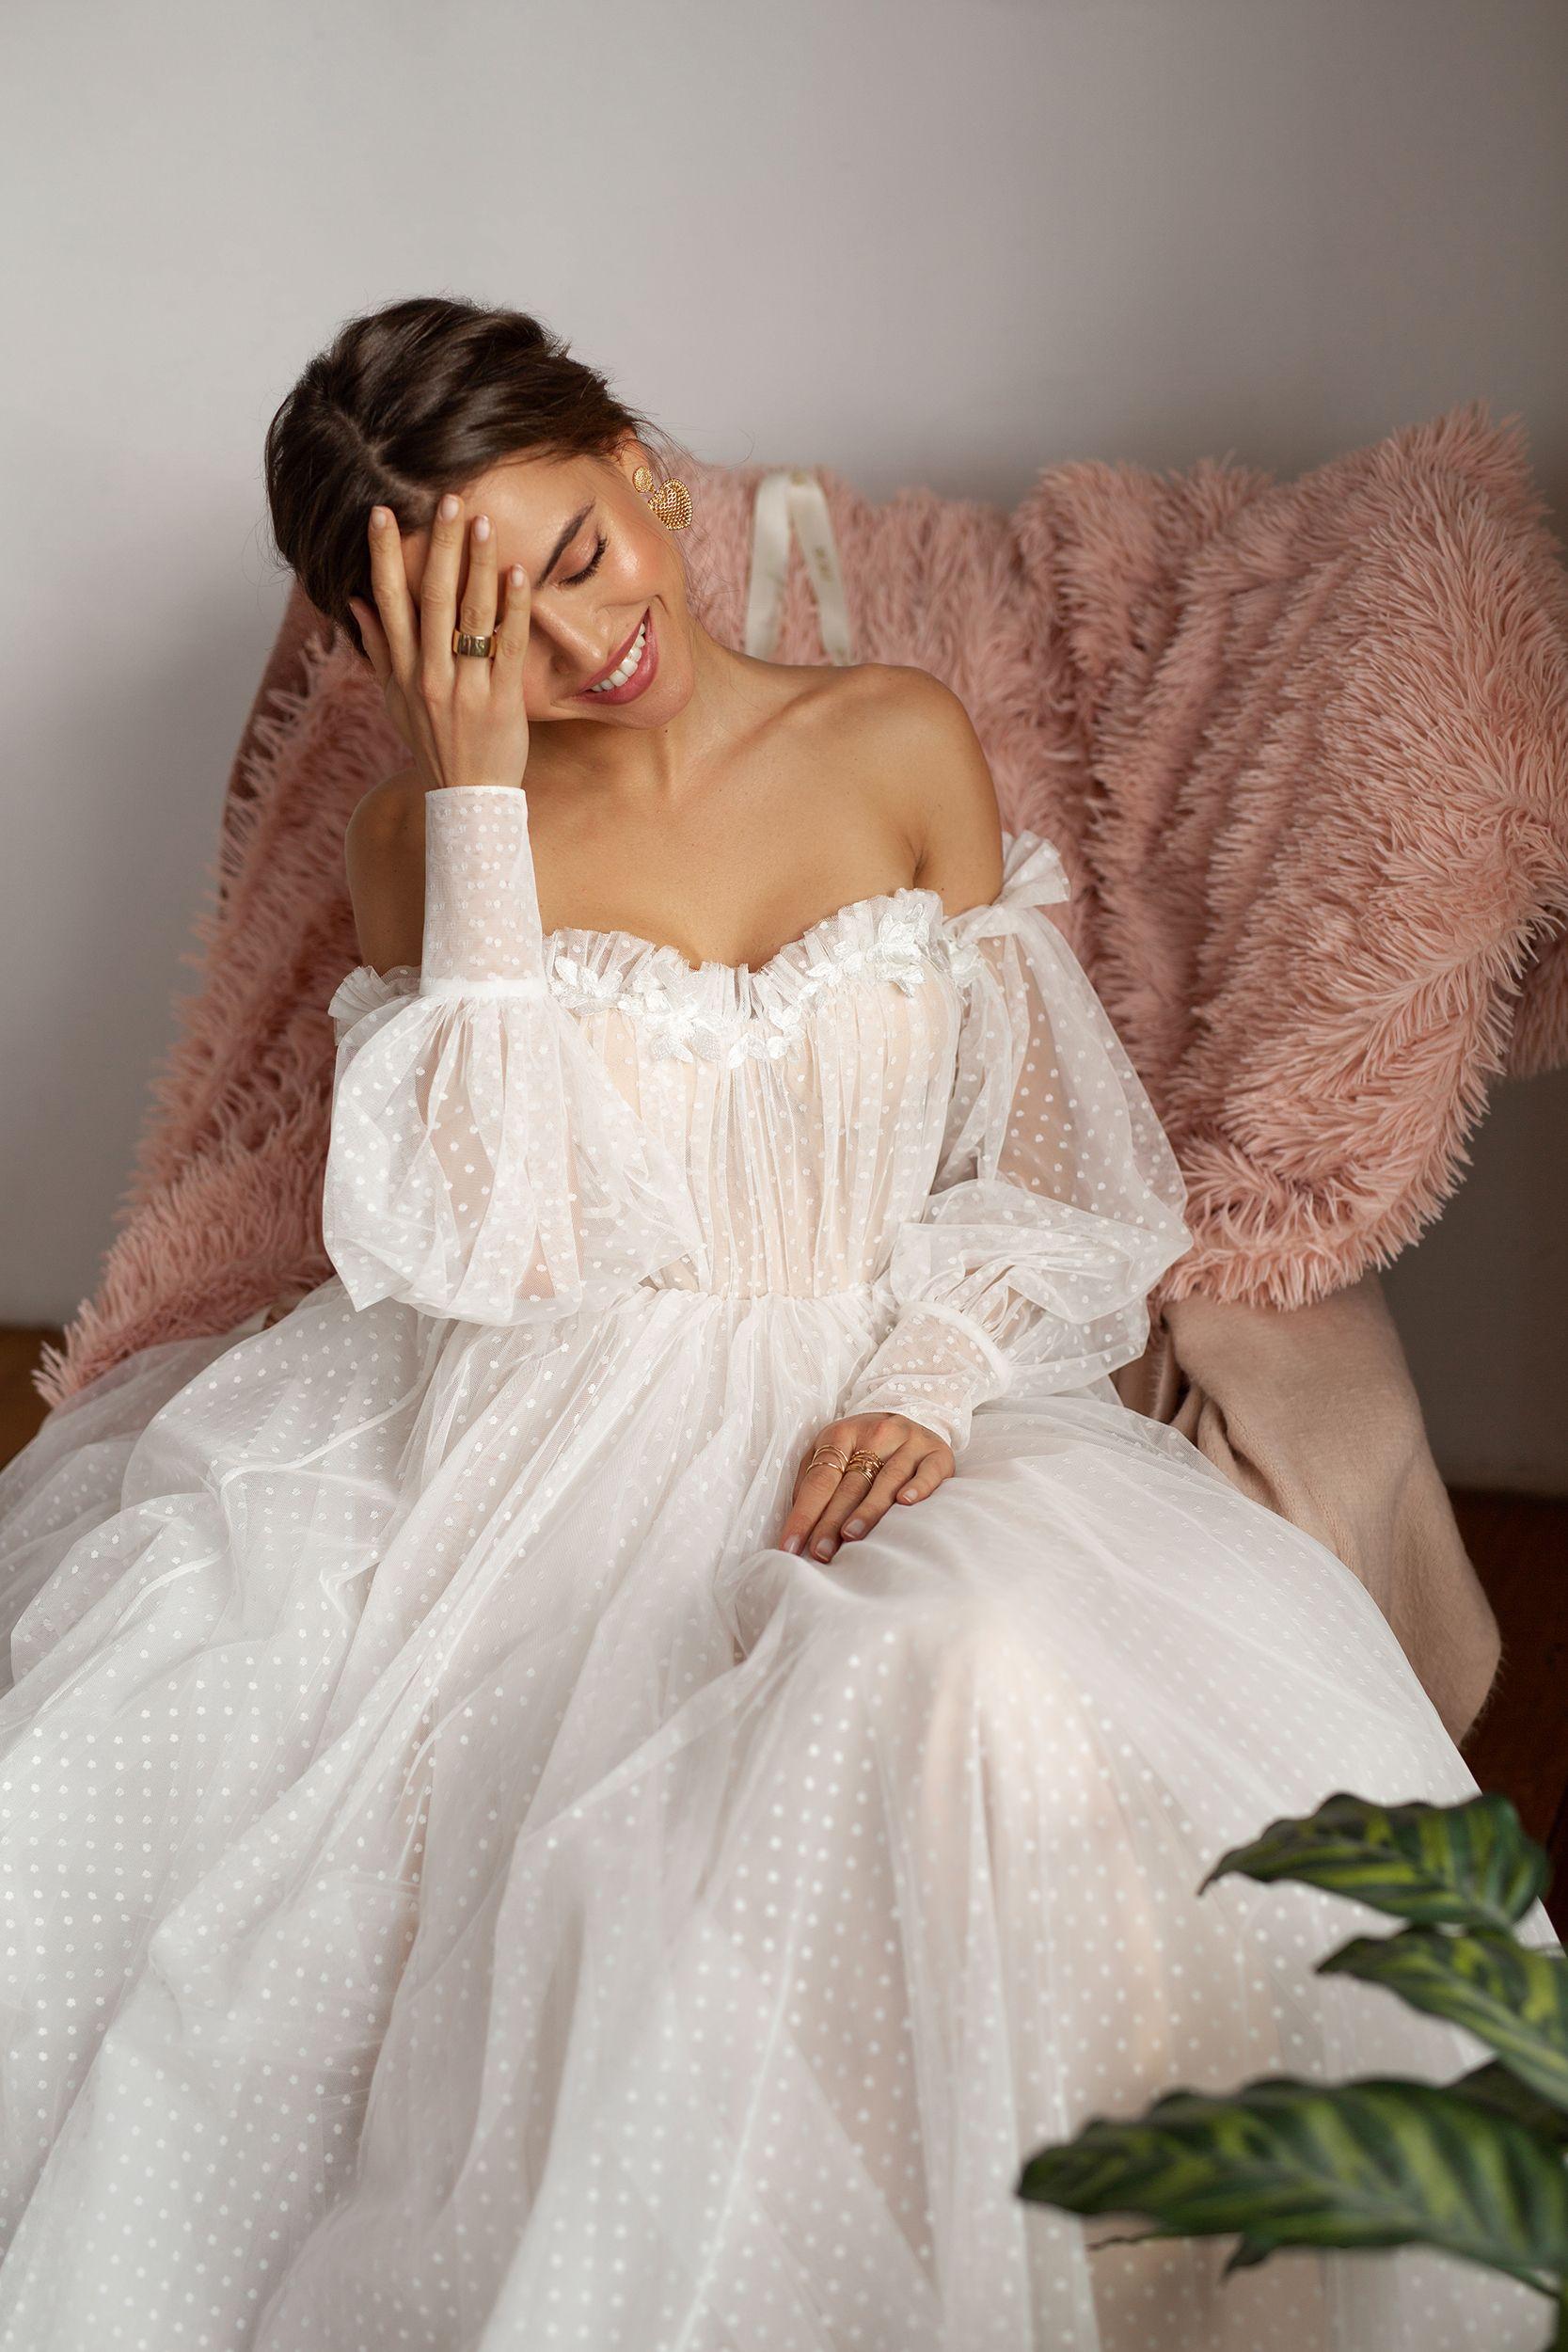 Mesh Wedding Dress Trained Light Reception Dress Romantic Rustic Bride Bohemian Off Shoulder Dress Delicate Sweetheart Bridal Gown In 2021 Sweetheart Bridal Gown Wedding Dress Train Wedding Dresses